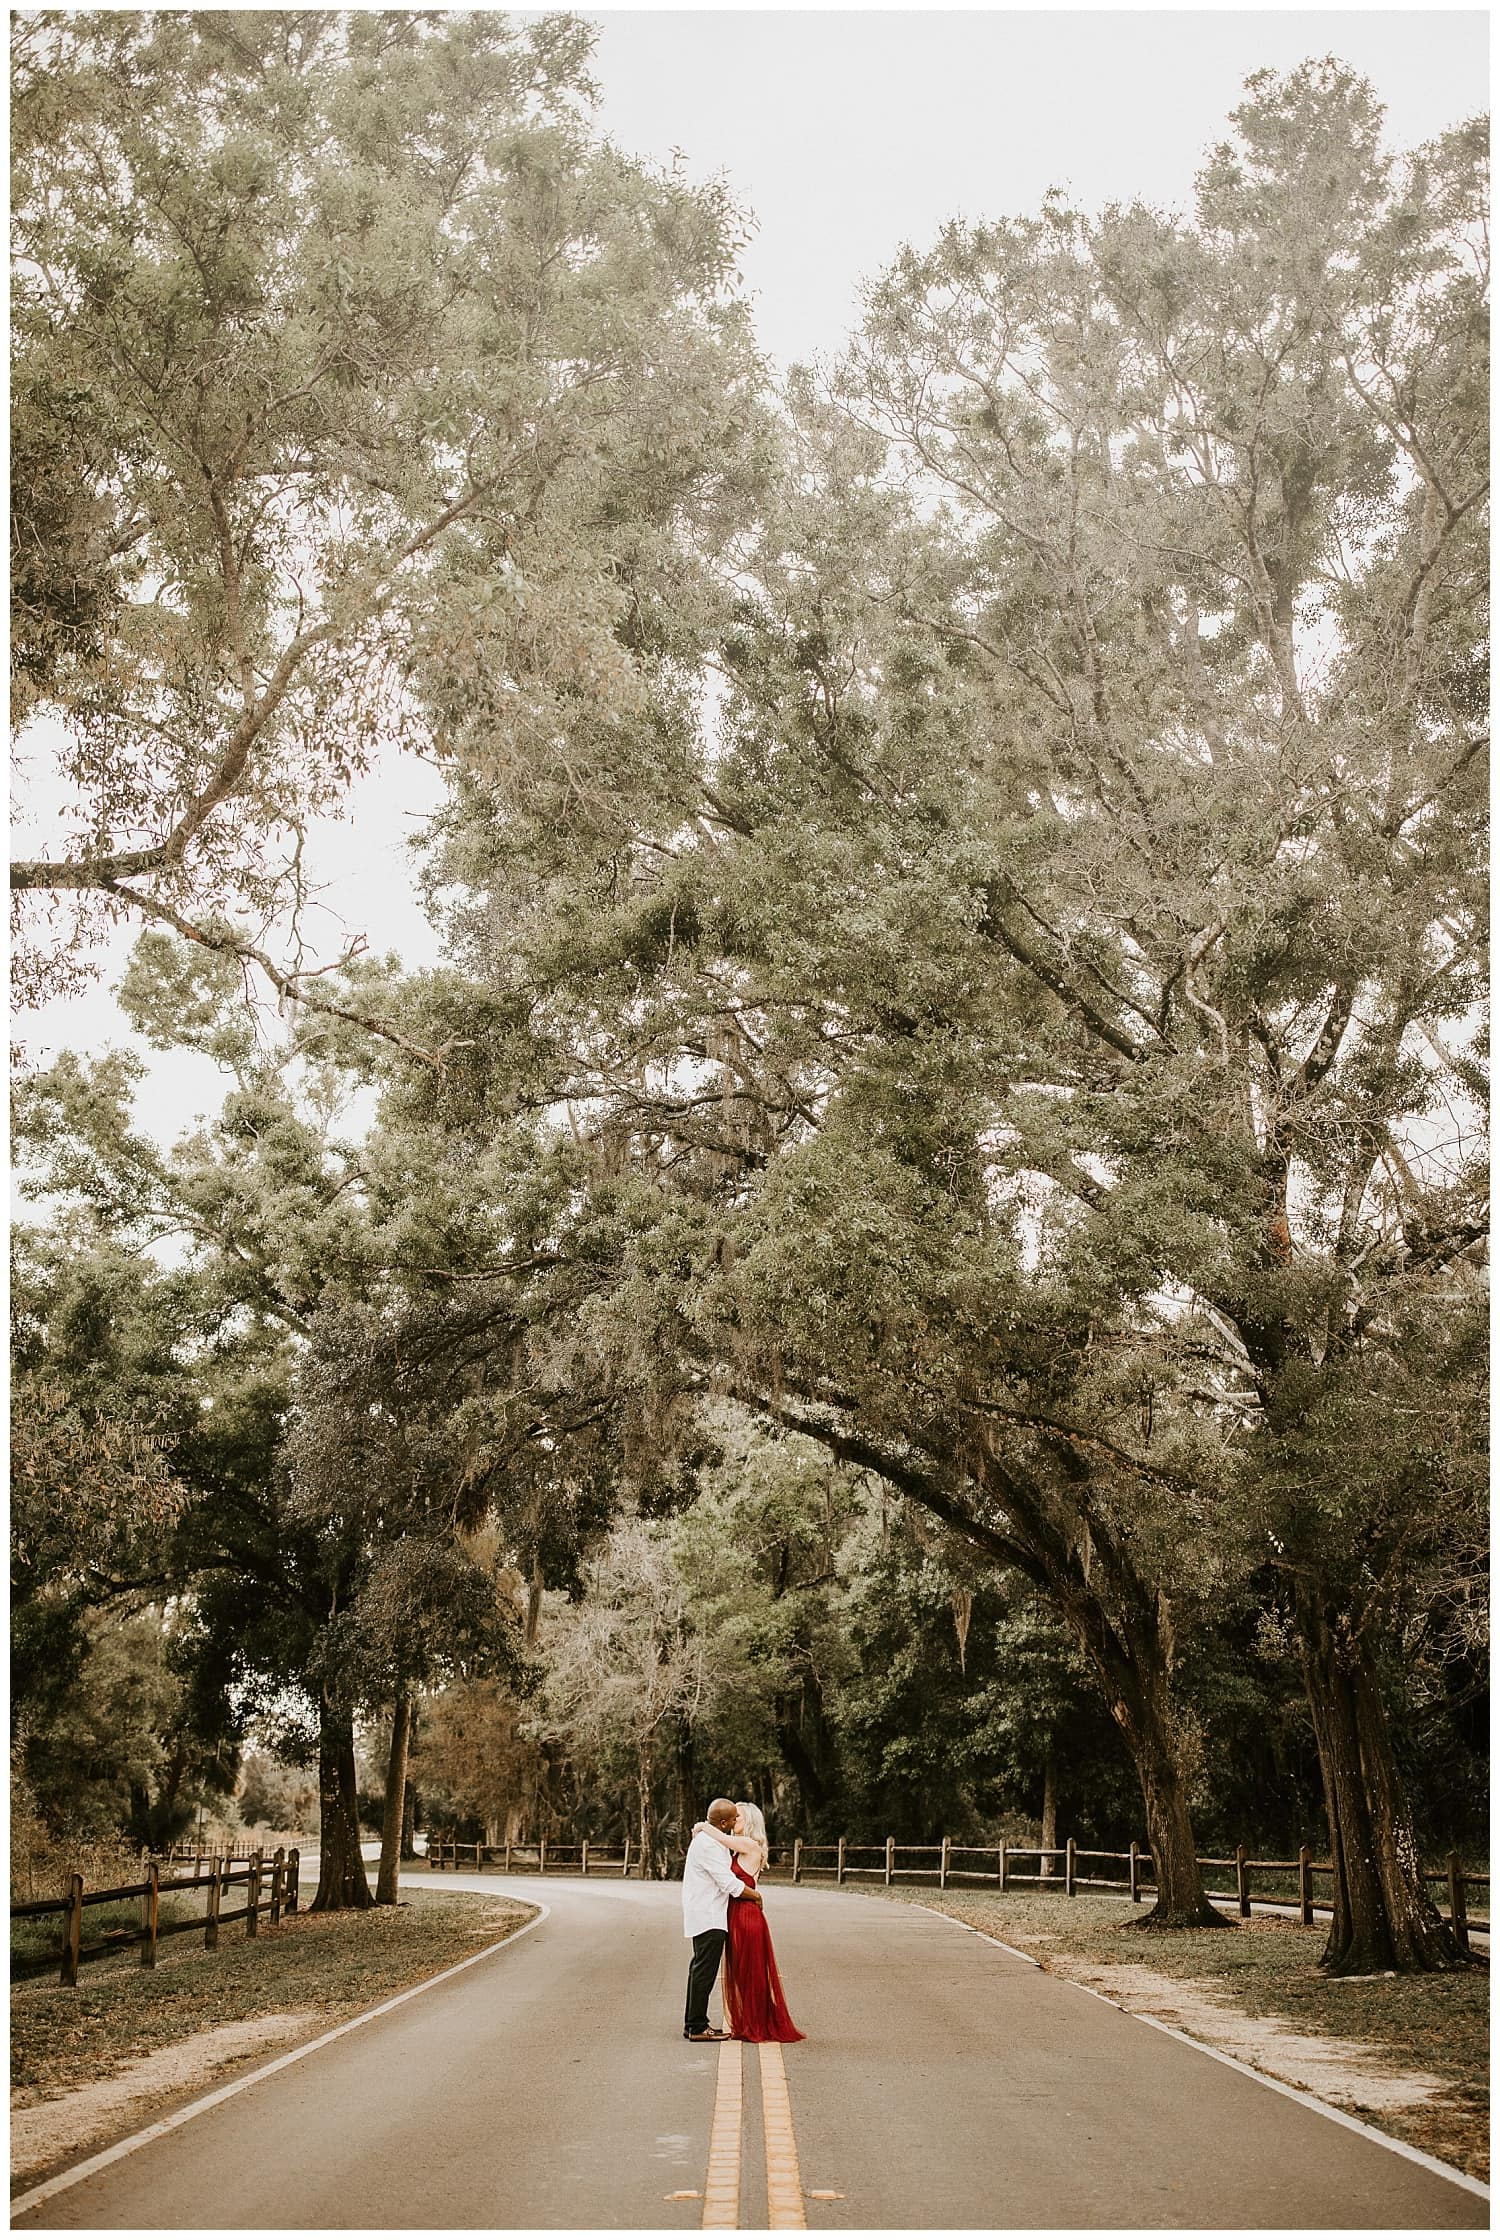 florida forest engagement photos,florida woodsy engagement,forest engagement photos,jupiter engagement photos,jupiter photographer,jupiter wedding photographer,palm beach engagement,palm beach photographer,palm beach wedding photographer,red engagement dress,riverbend park,riverbend park engagement,stuart engagement,stuart photographer,stuart wedding photographer,tequesta photographer,wellington photographer,woodsy engagement photos,